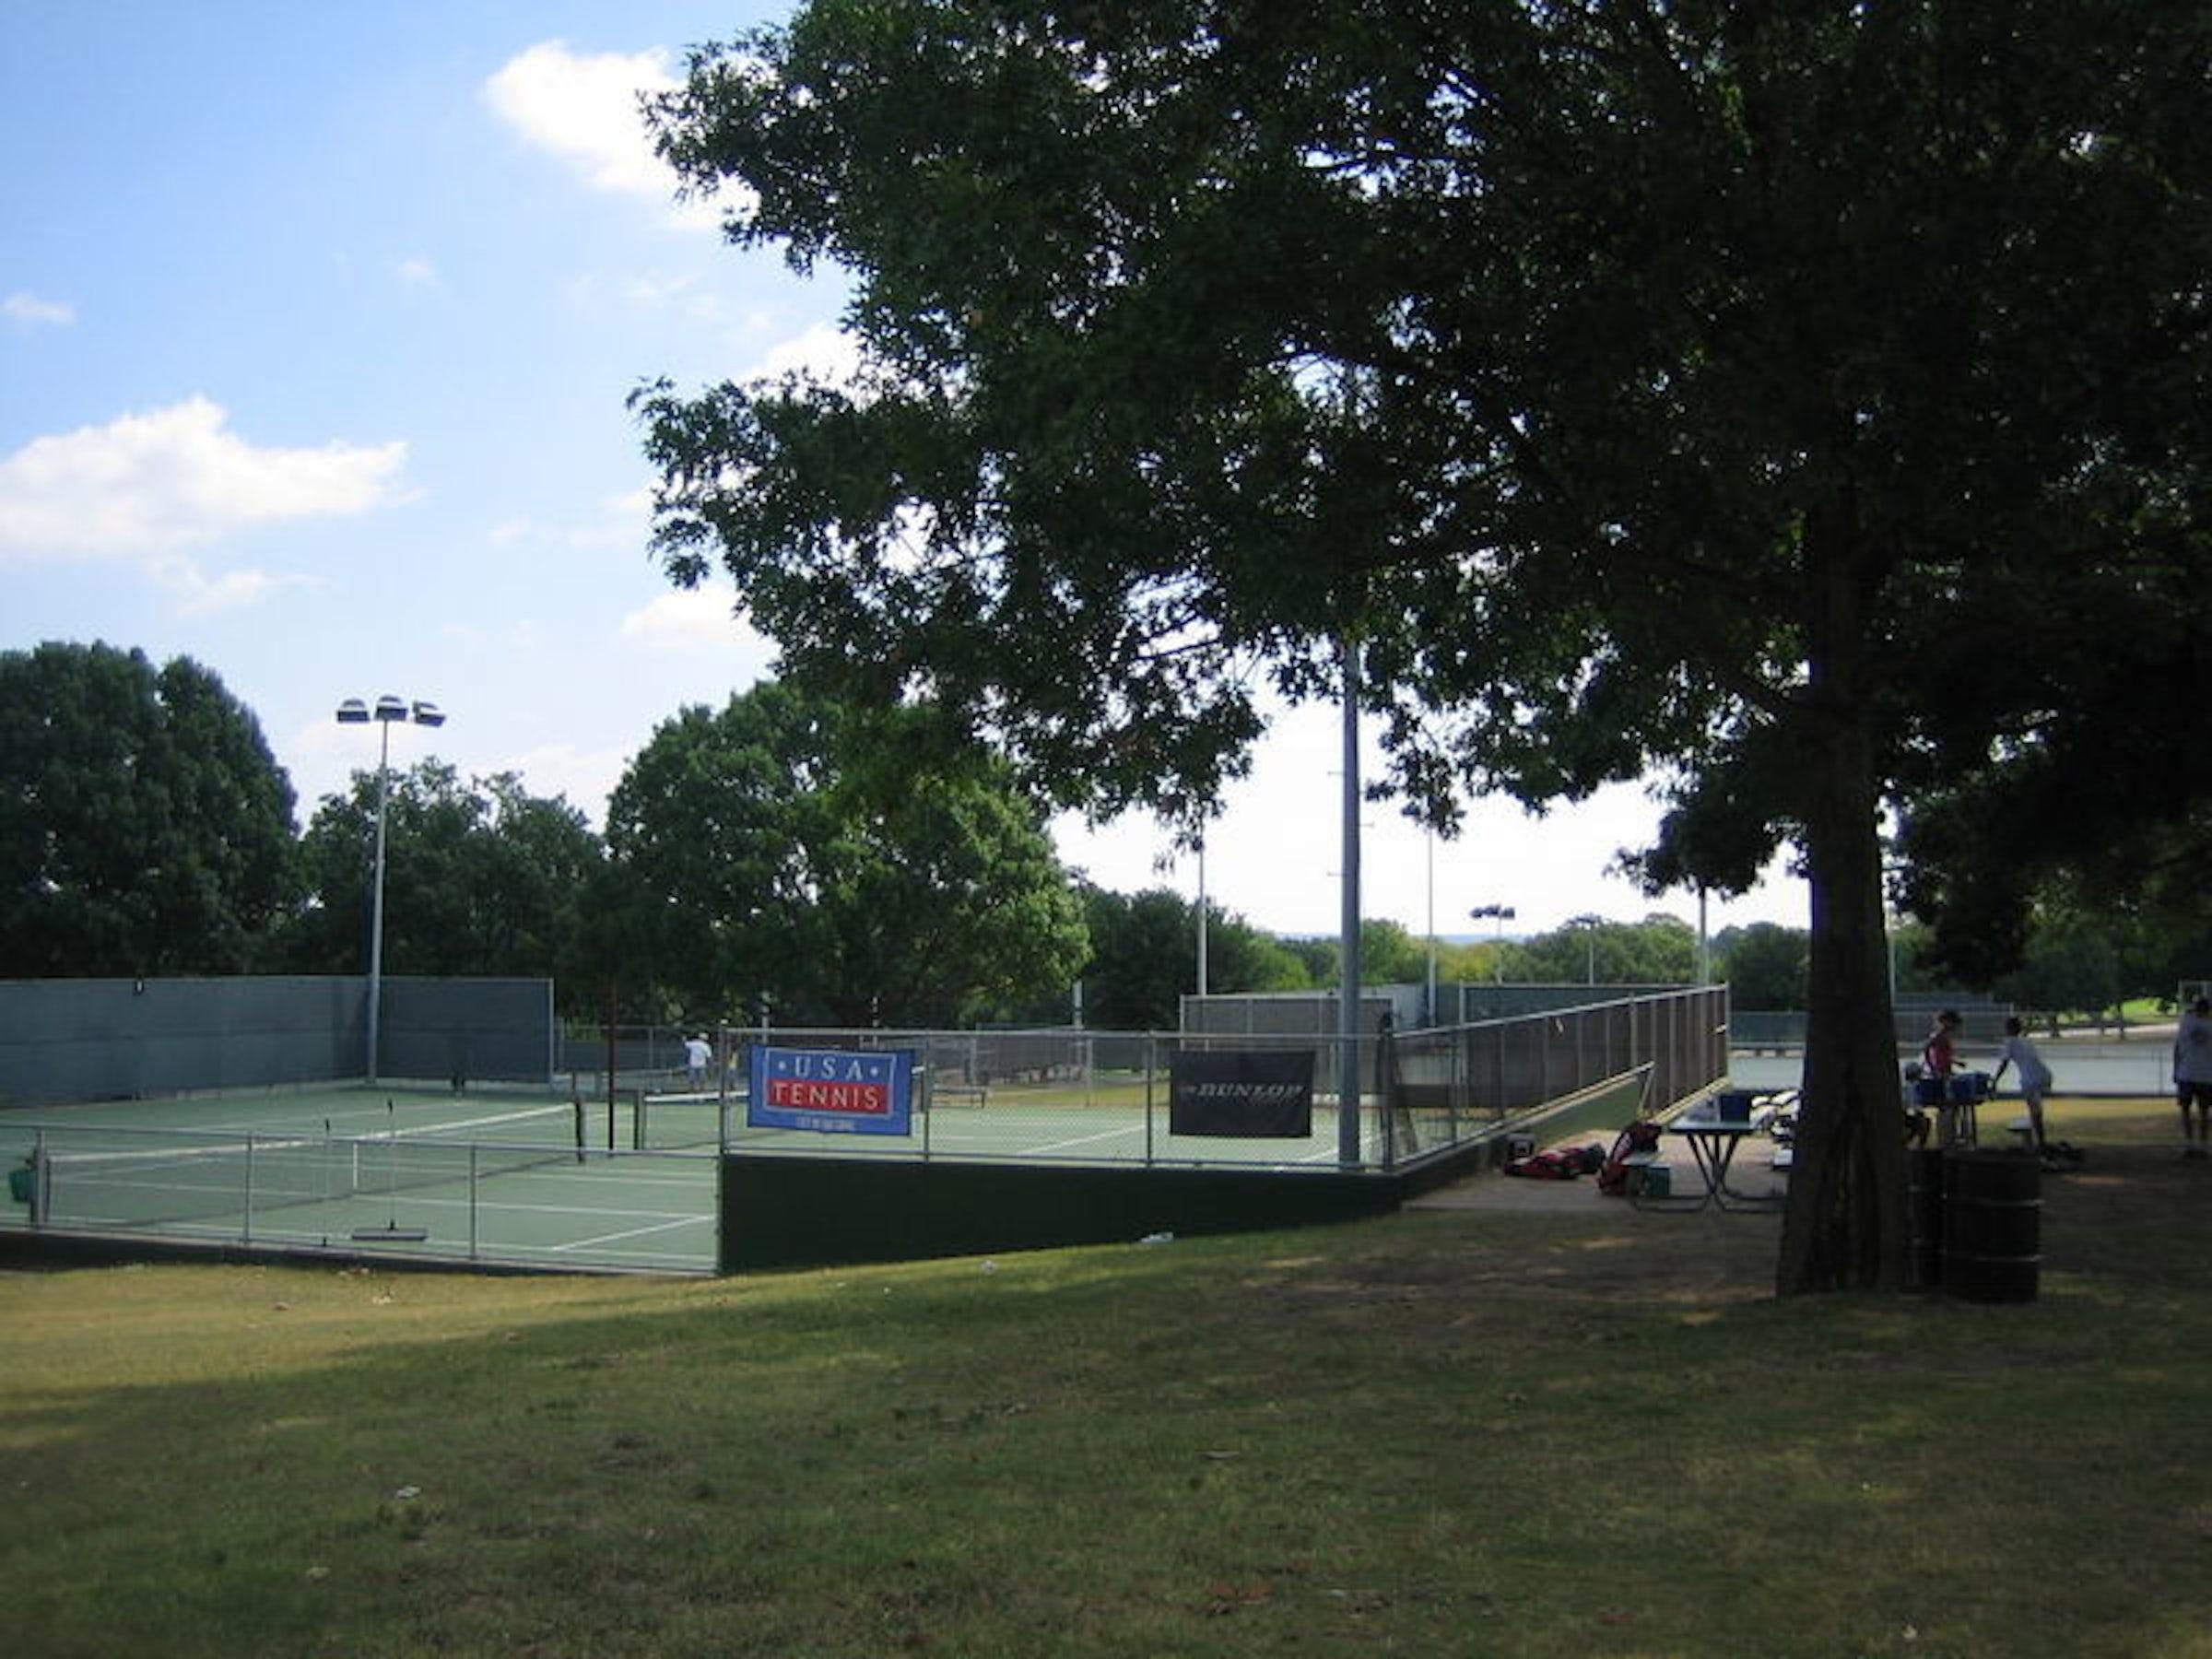 Samuell Grand Park in Beyond Dallas